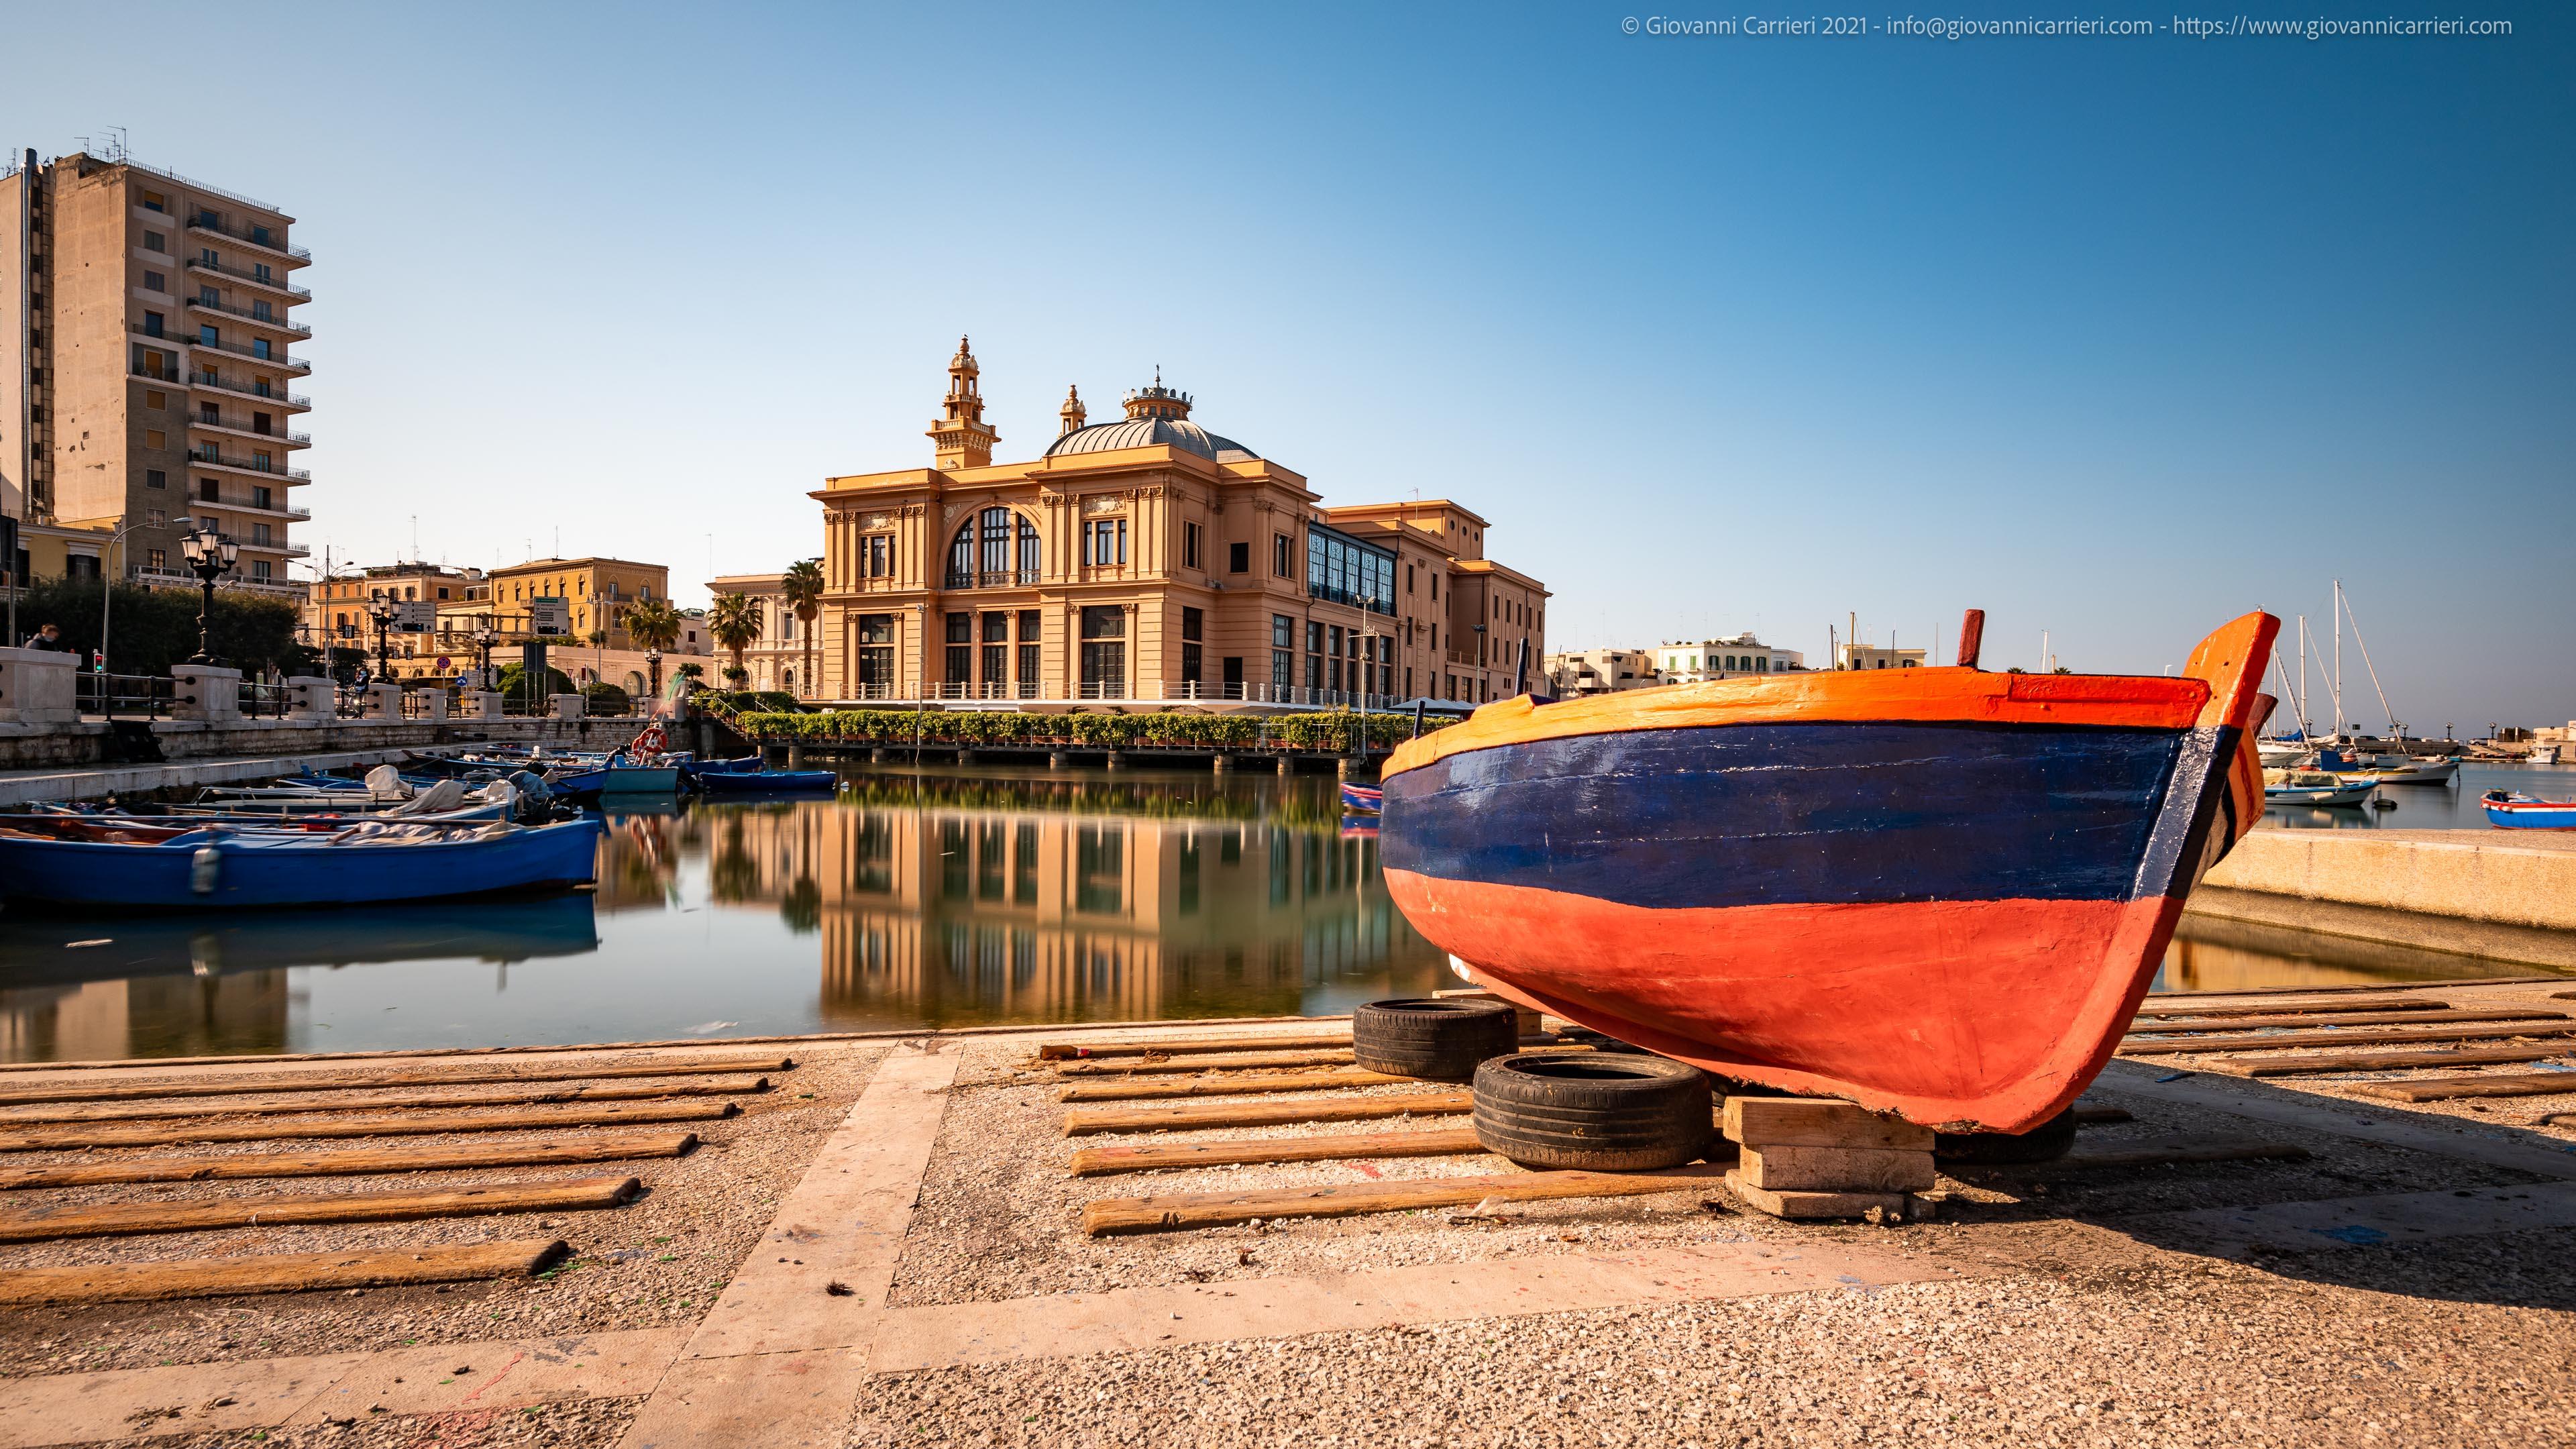 The city center of Bari One of the most characteristic places of Bari, which crosses Corso Vittorio Emanuele, Corso Cavour with the waterfront Araldo di Crollalanza